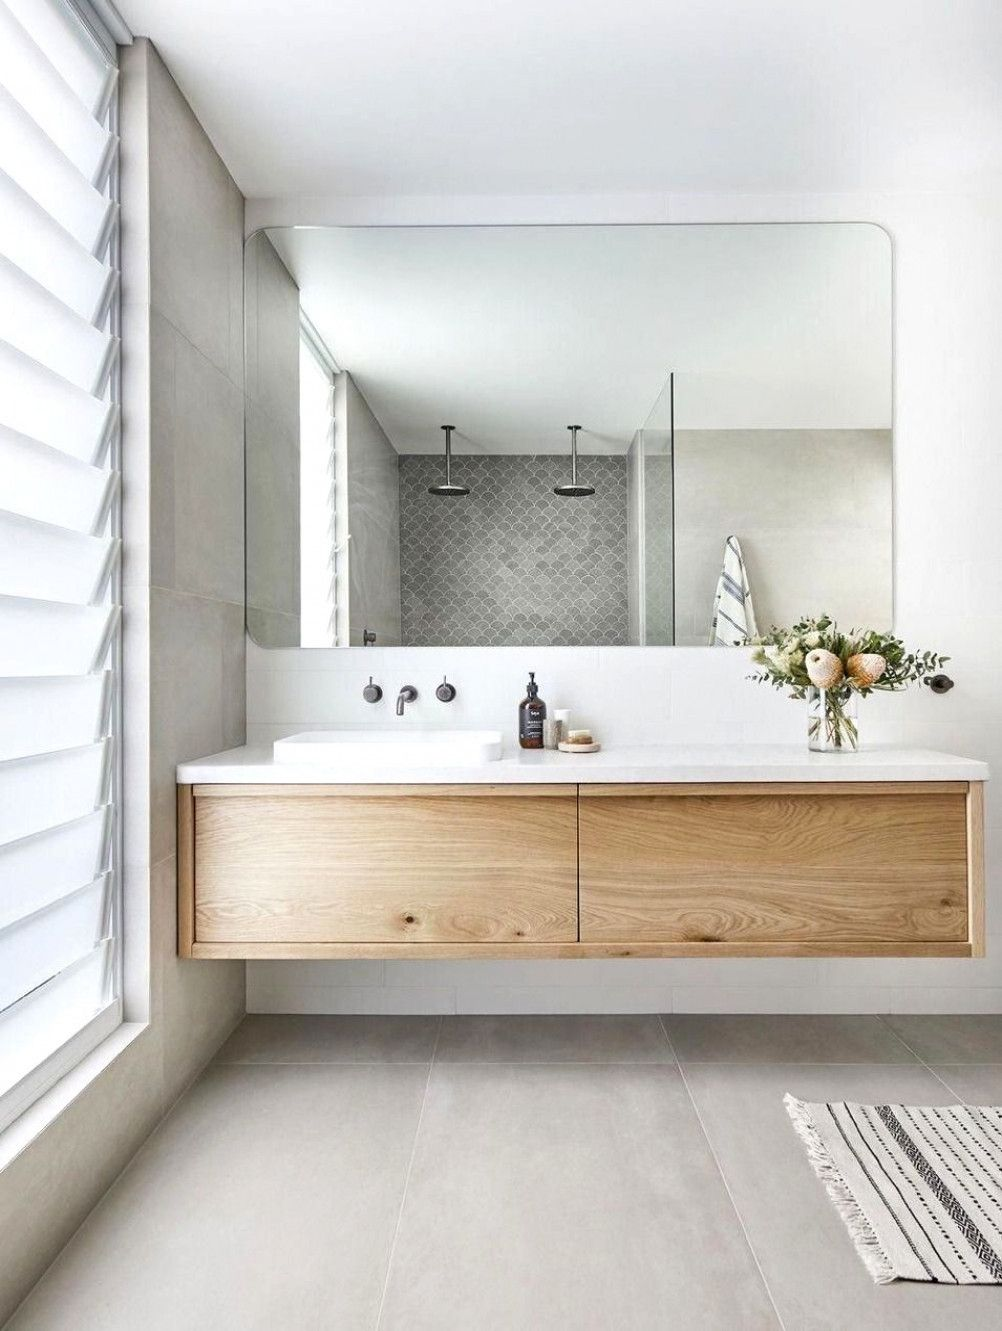 Bathroom Inspiration Masterbathroomideas Luxury Bathroom Master Baths Bathroom Trends Timber Vanity